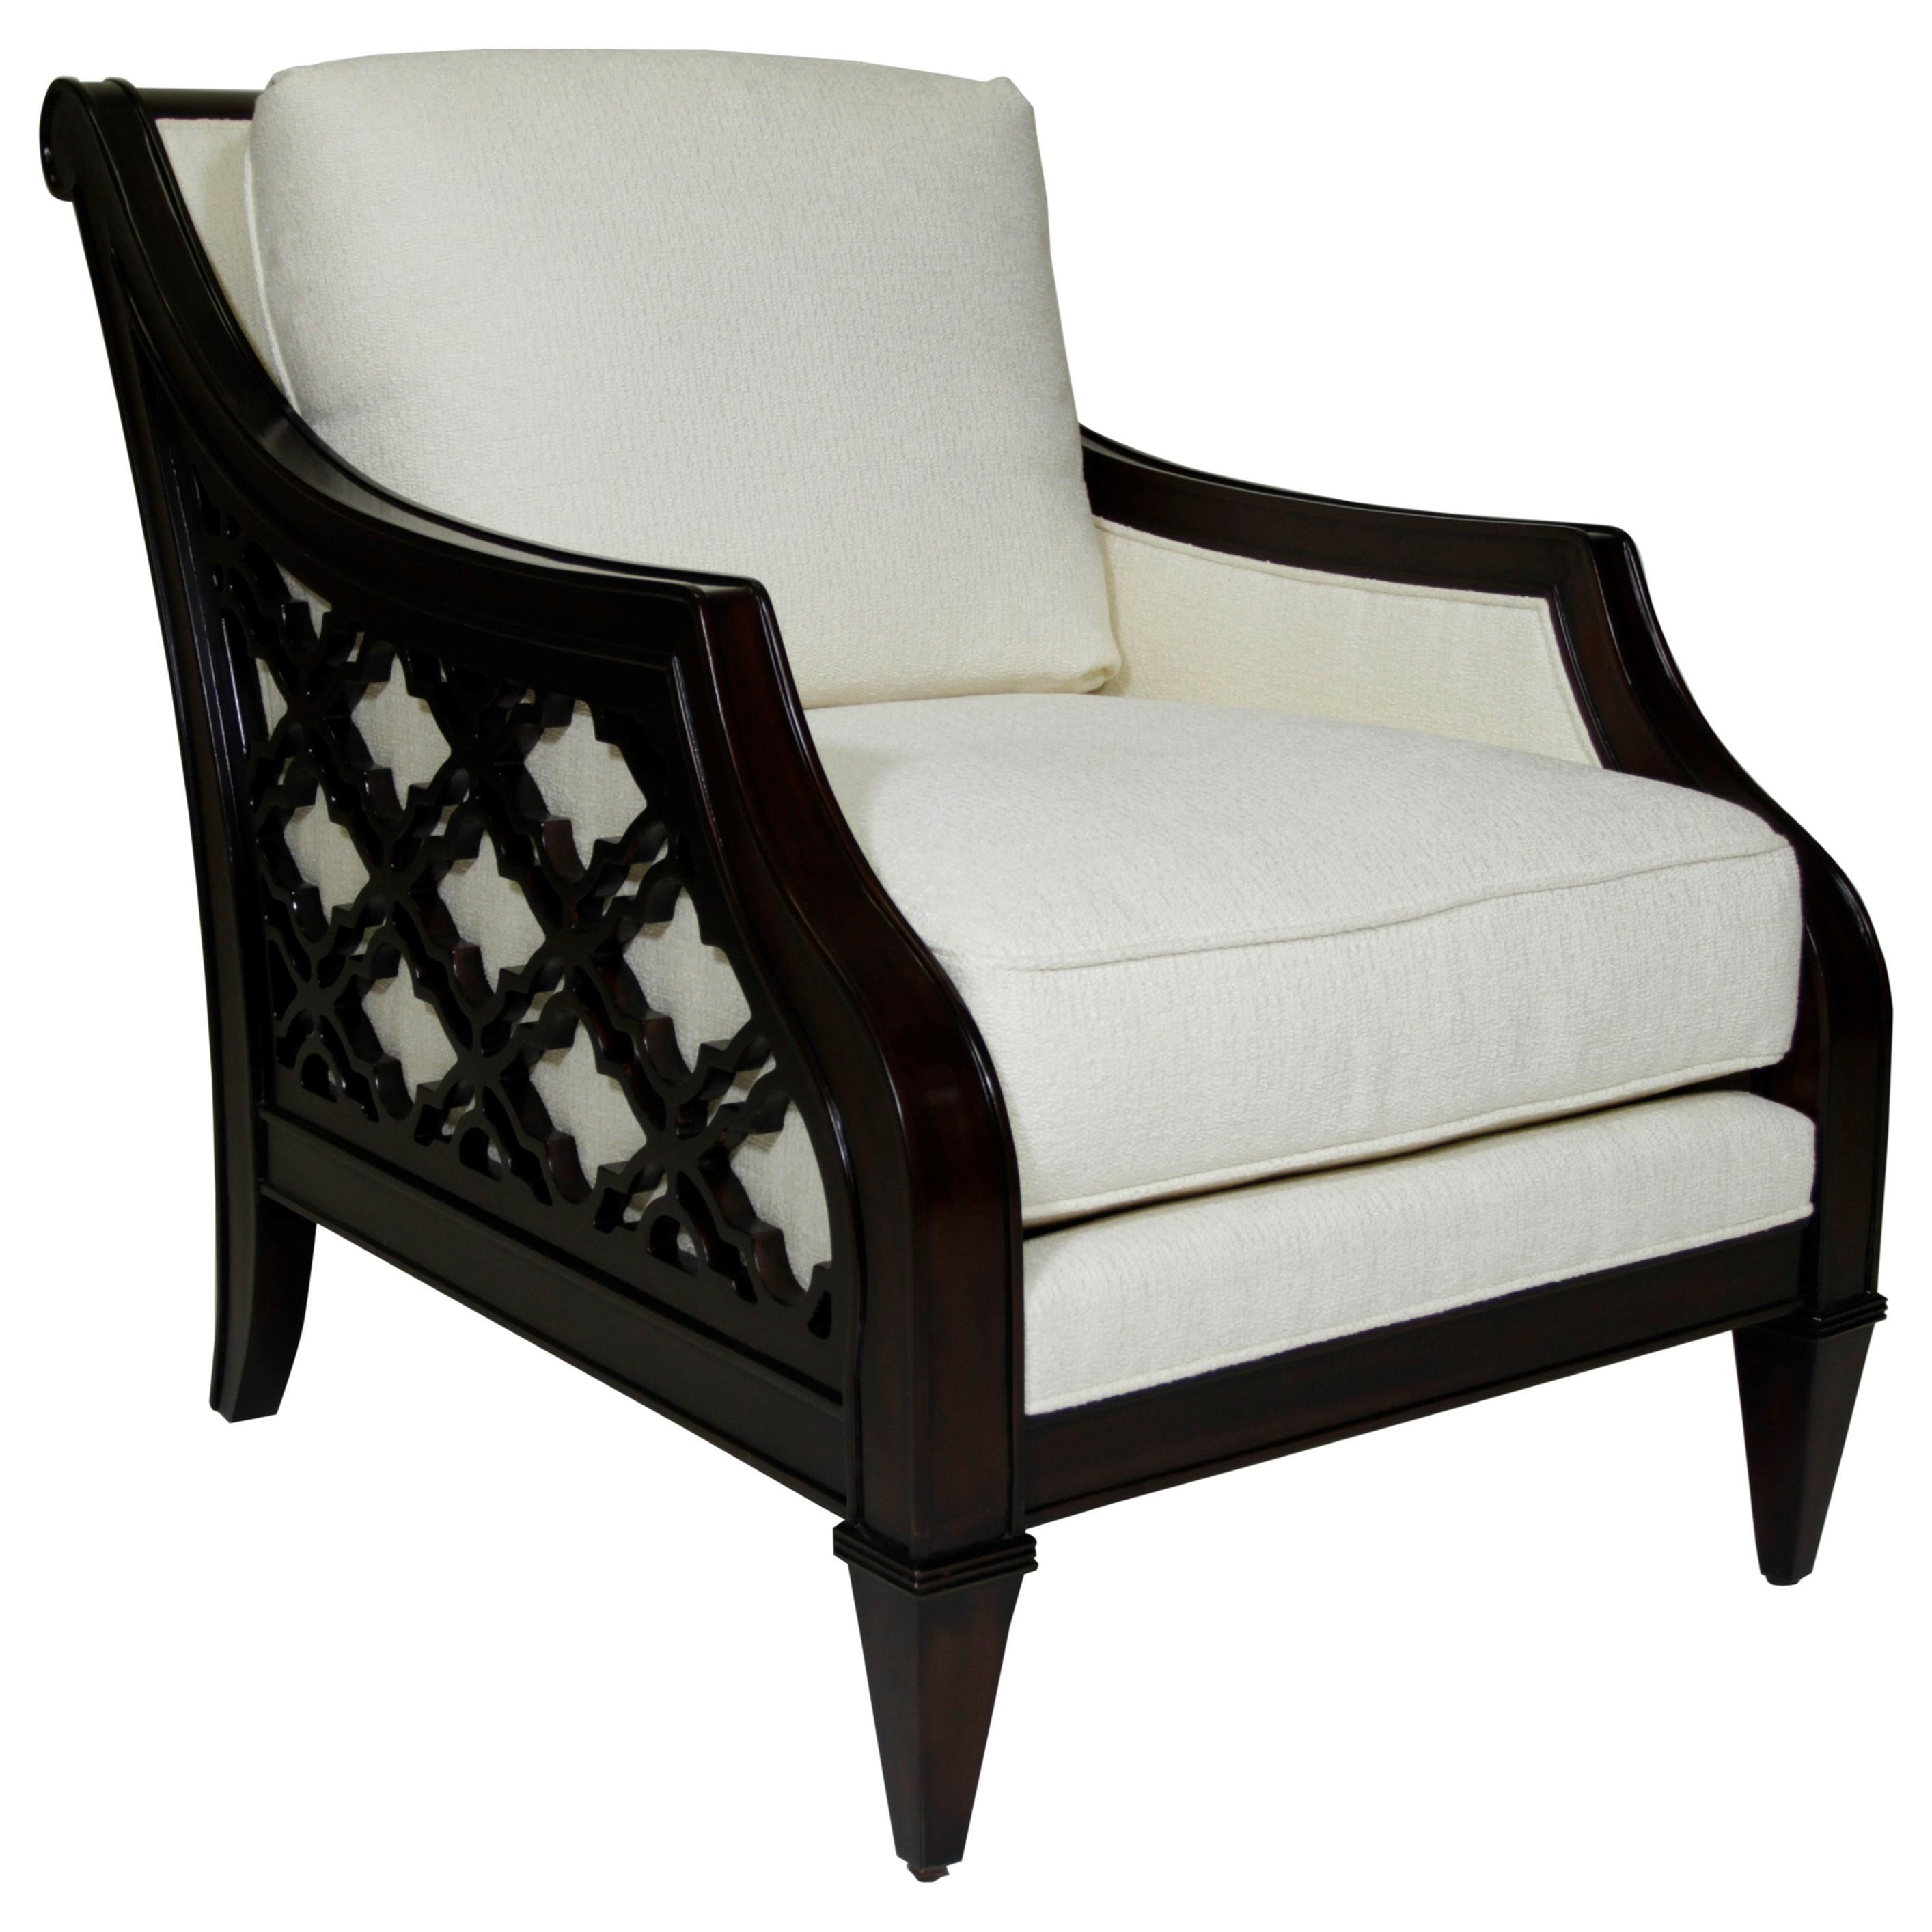 Royal Kahala Bay Club Chair by Tommy Bahama Home at Baer's Furniture